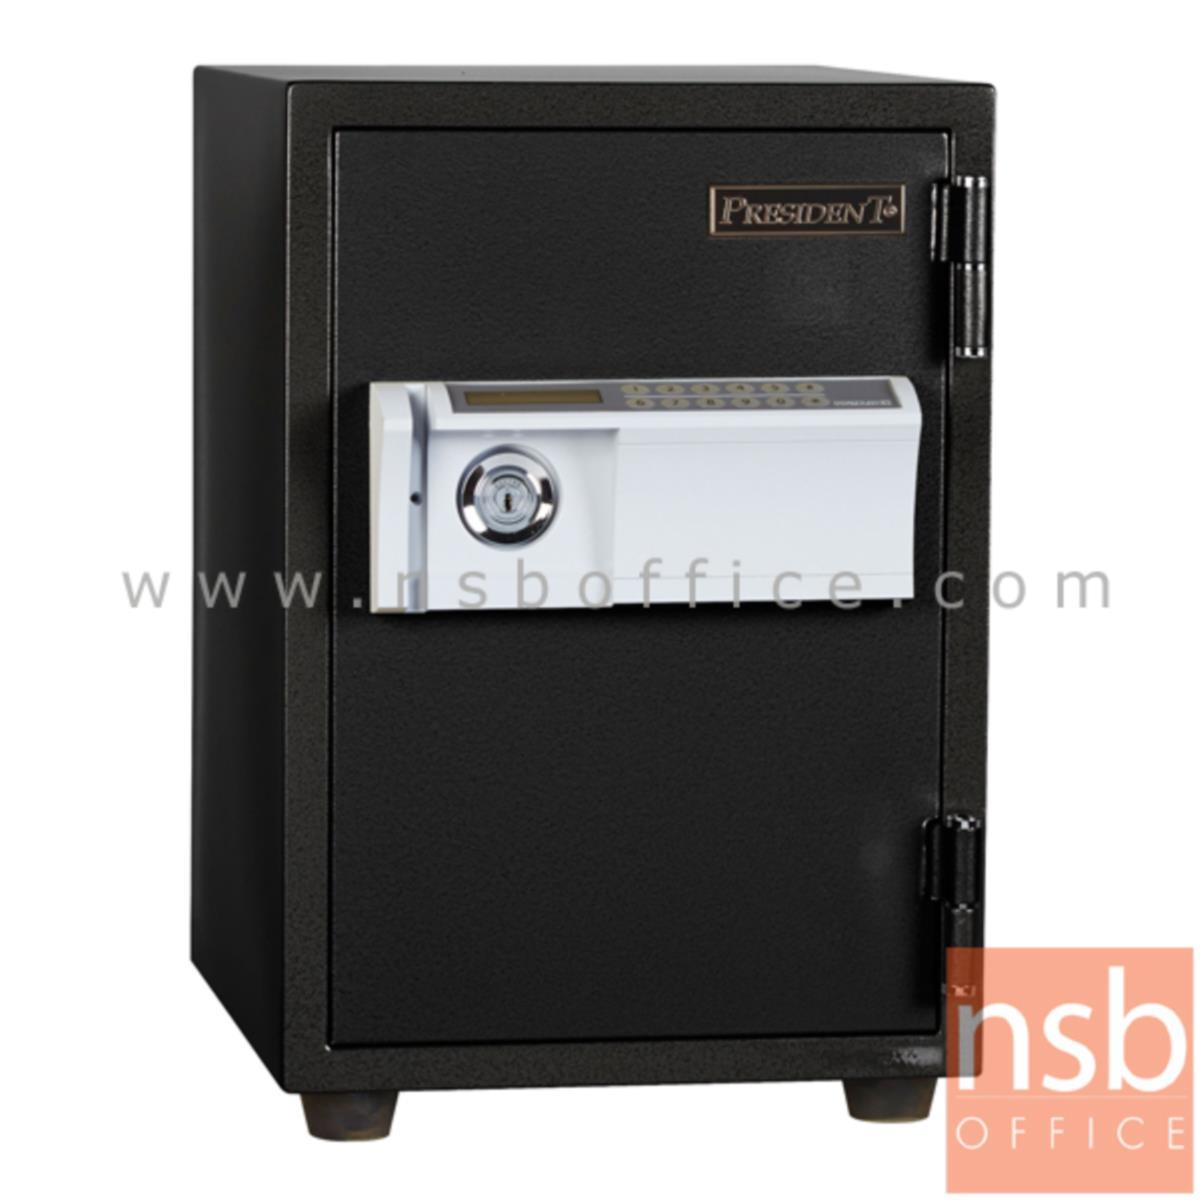 F05A055:ตู้เซฟดิจิตอล 50 กก. แนวตั้ง รุ่น PRESIDENT-SS2D2  มี 1 กุญแจ 1 รหัส (รหัสใช้กดหน้าตู้)